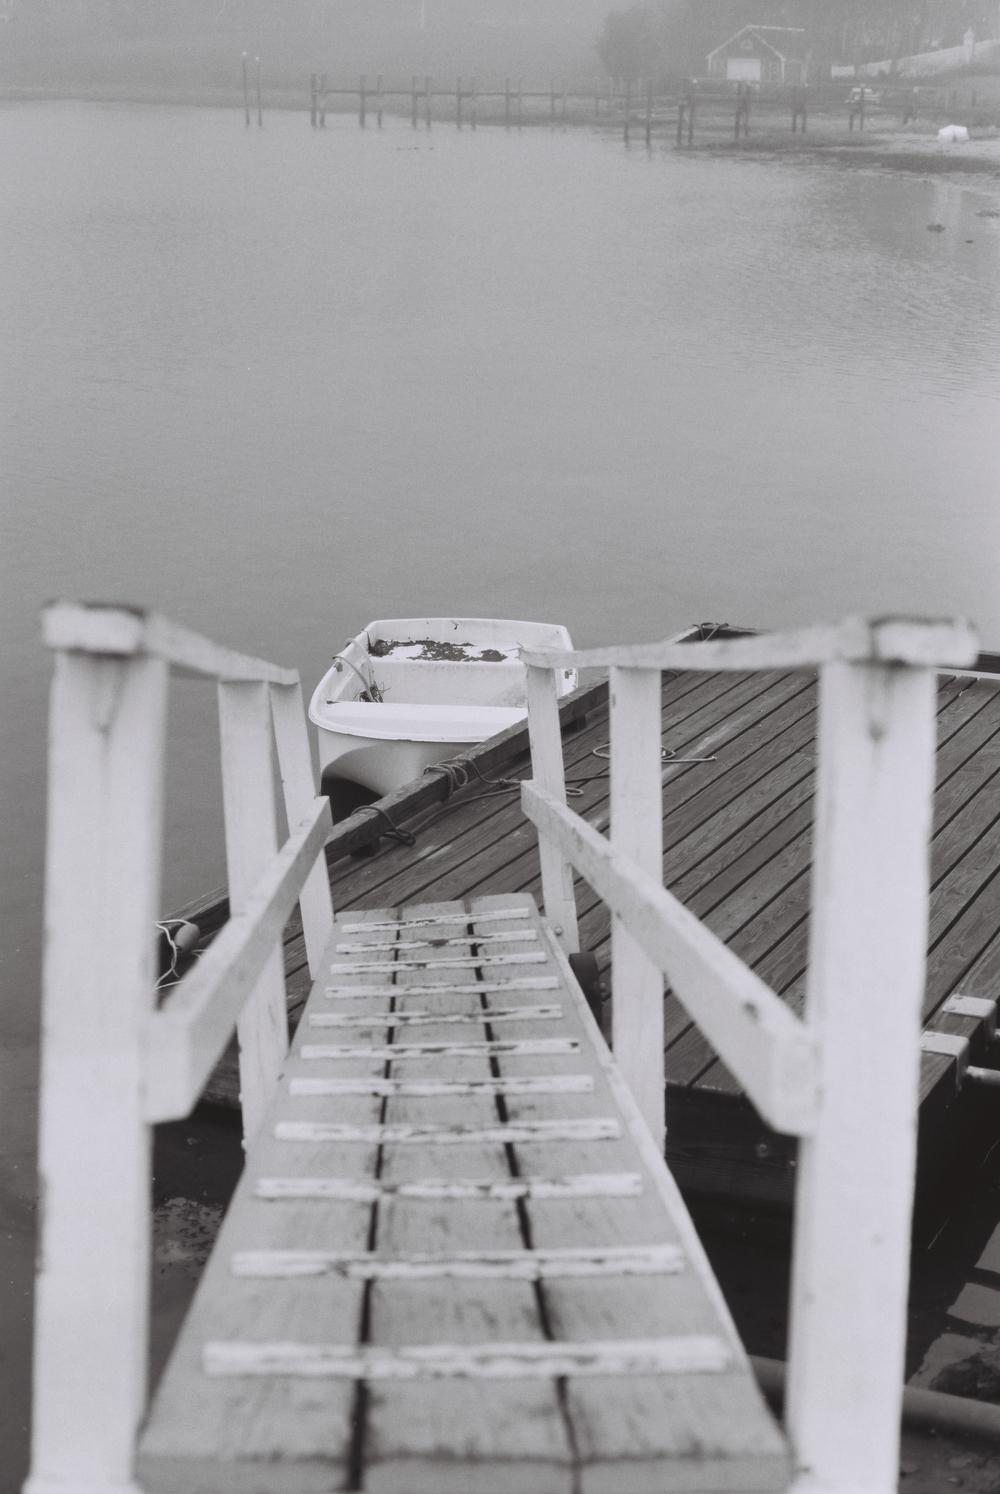 Boat, Harwich, MA